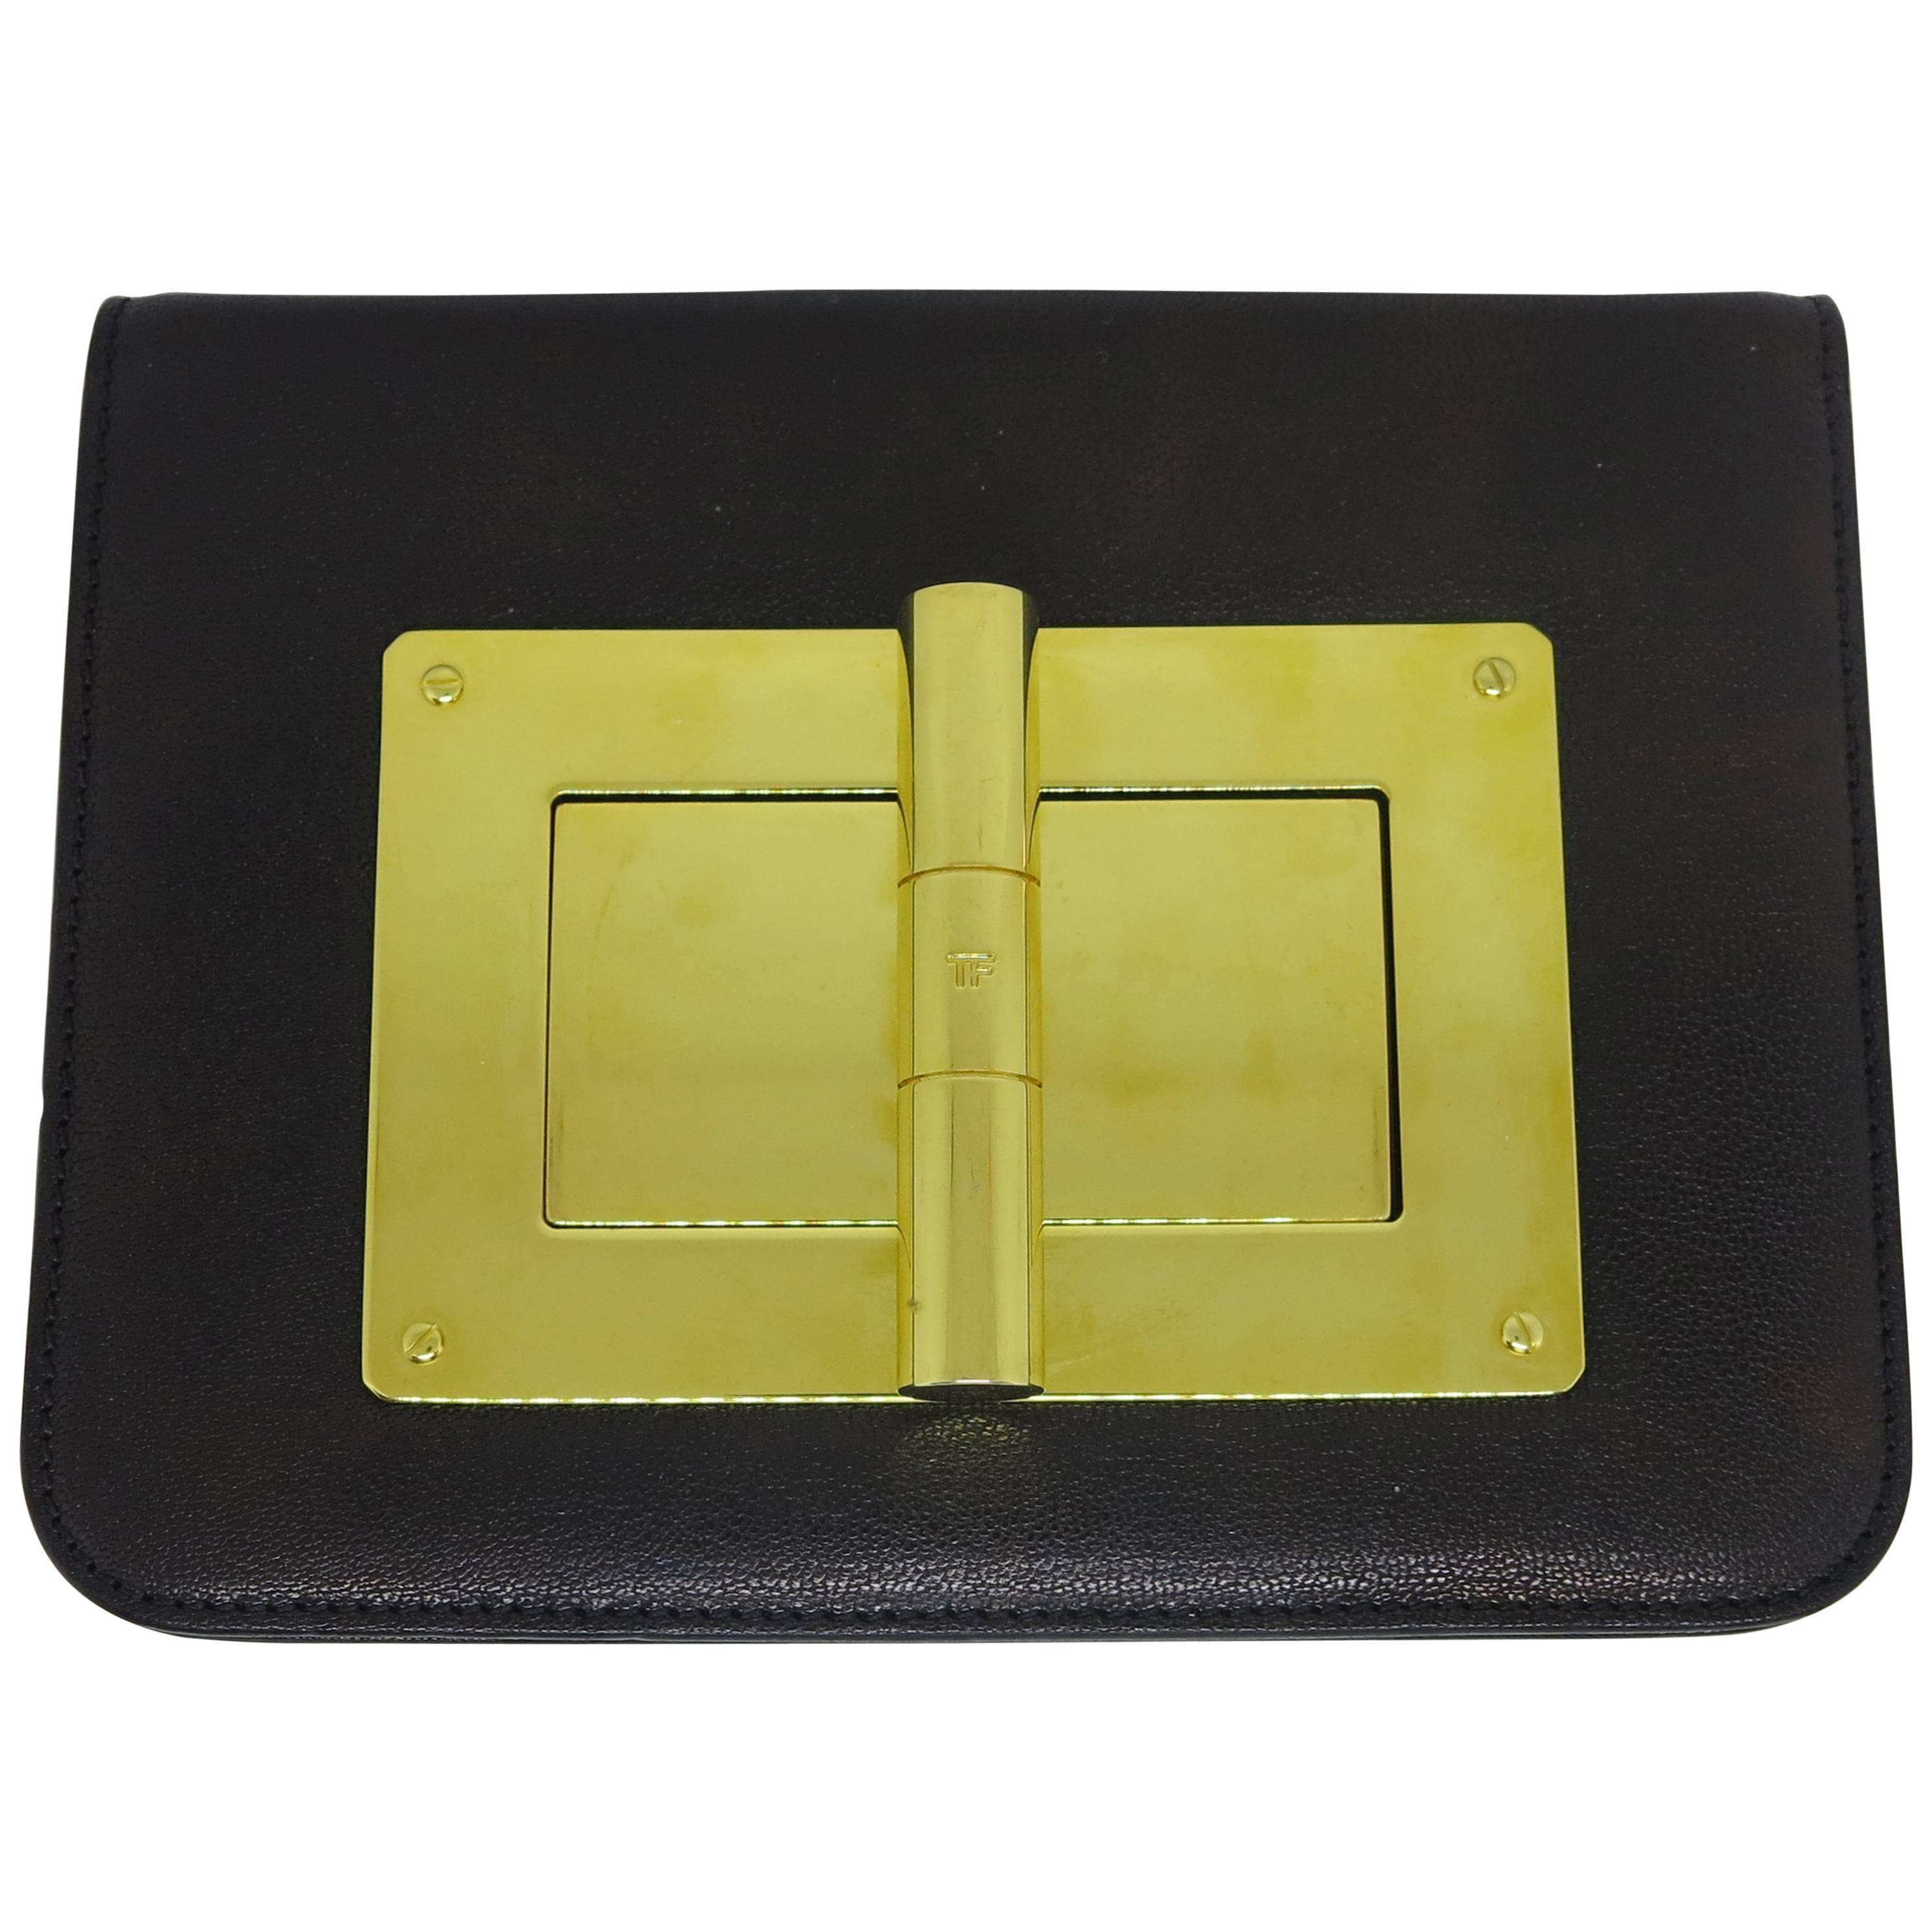 Tom Ford Natalia Medium Black Calf Leather Clutch Shoulder Bag